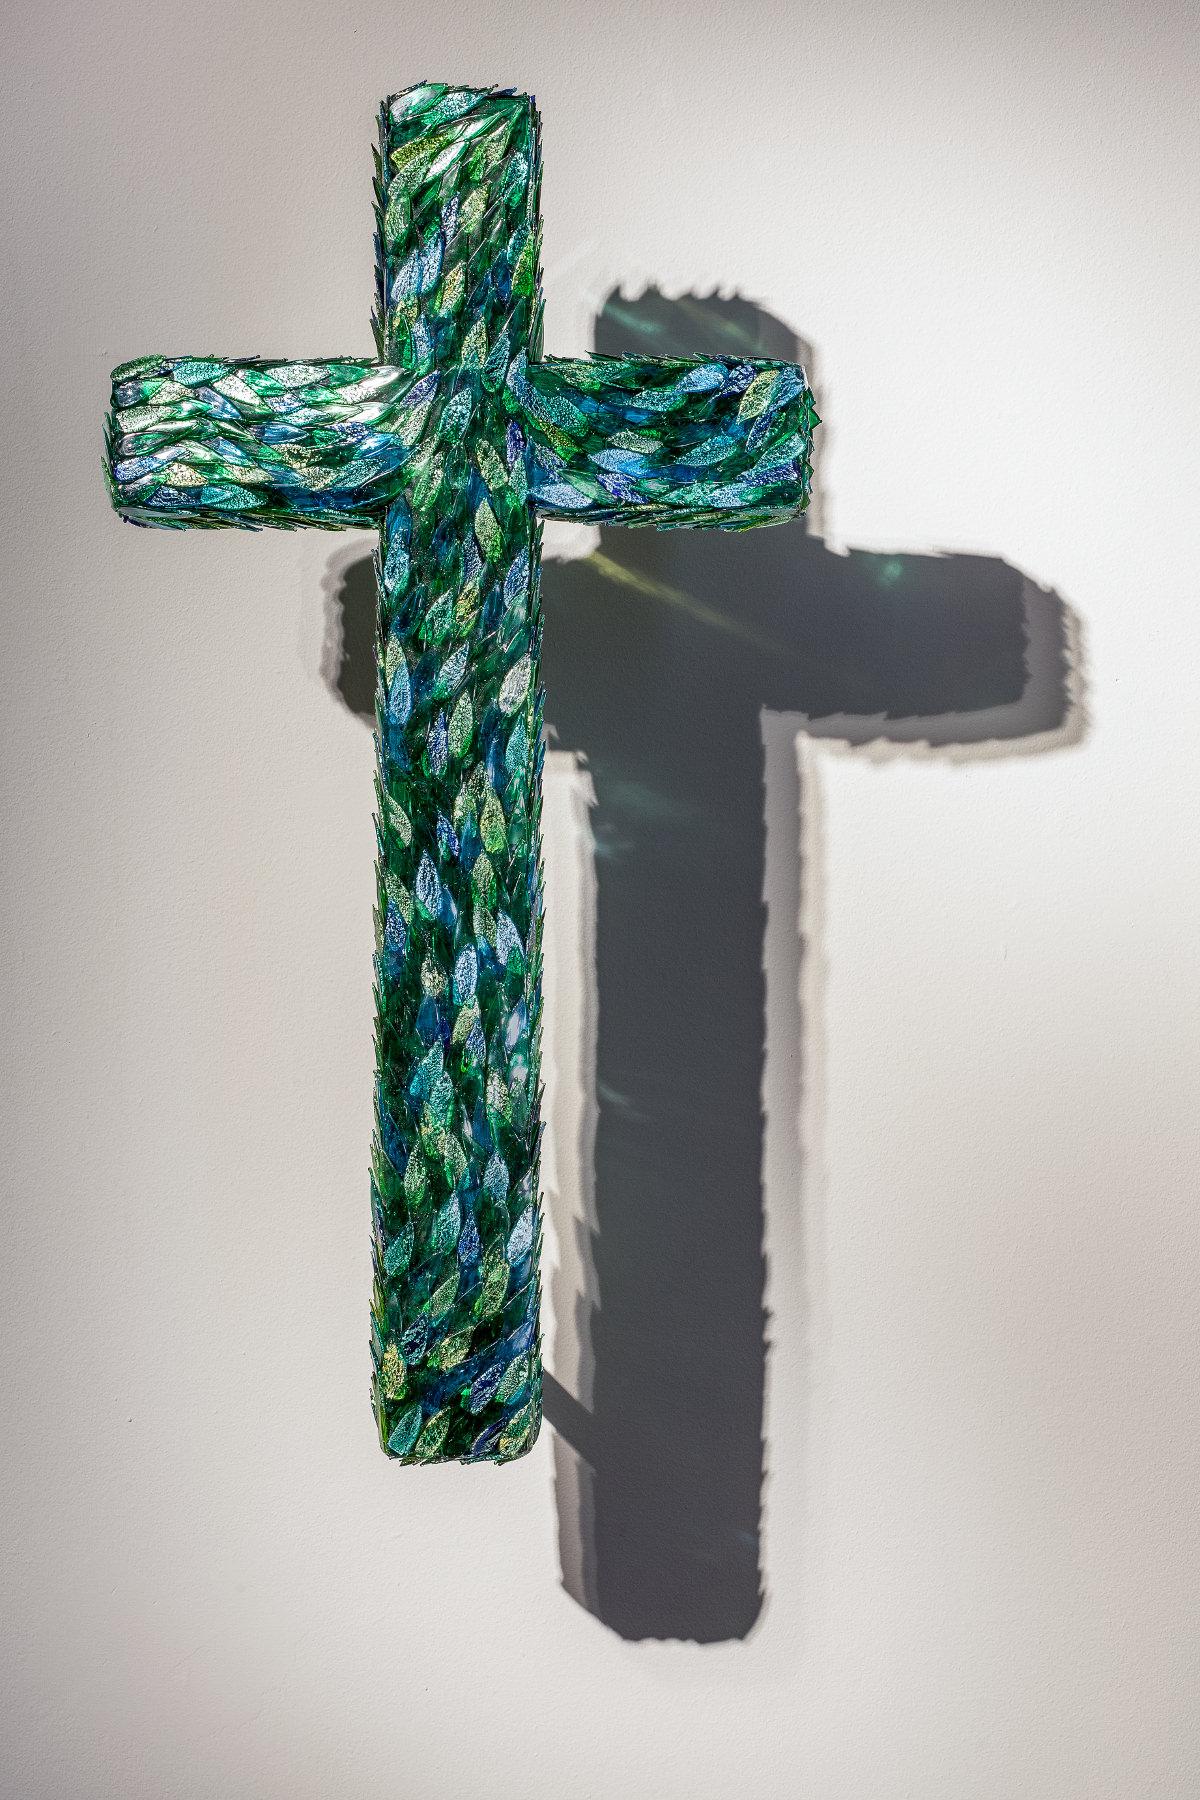 Jan Fabre - Cross for the Garden of Delight